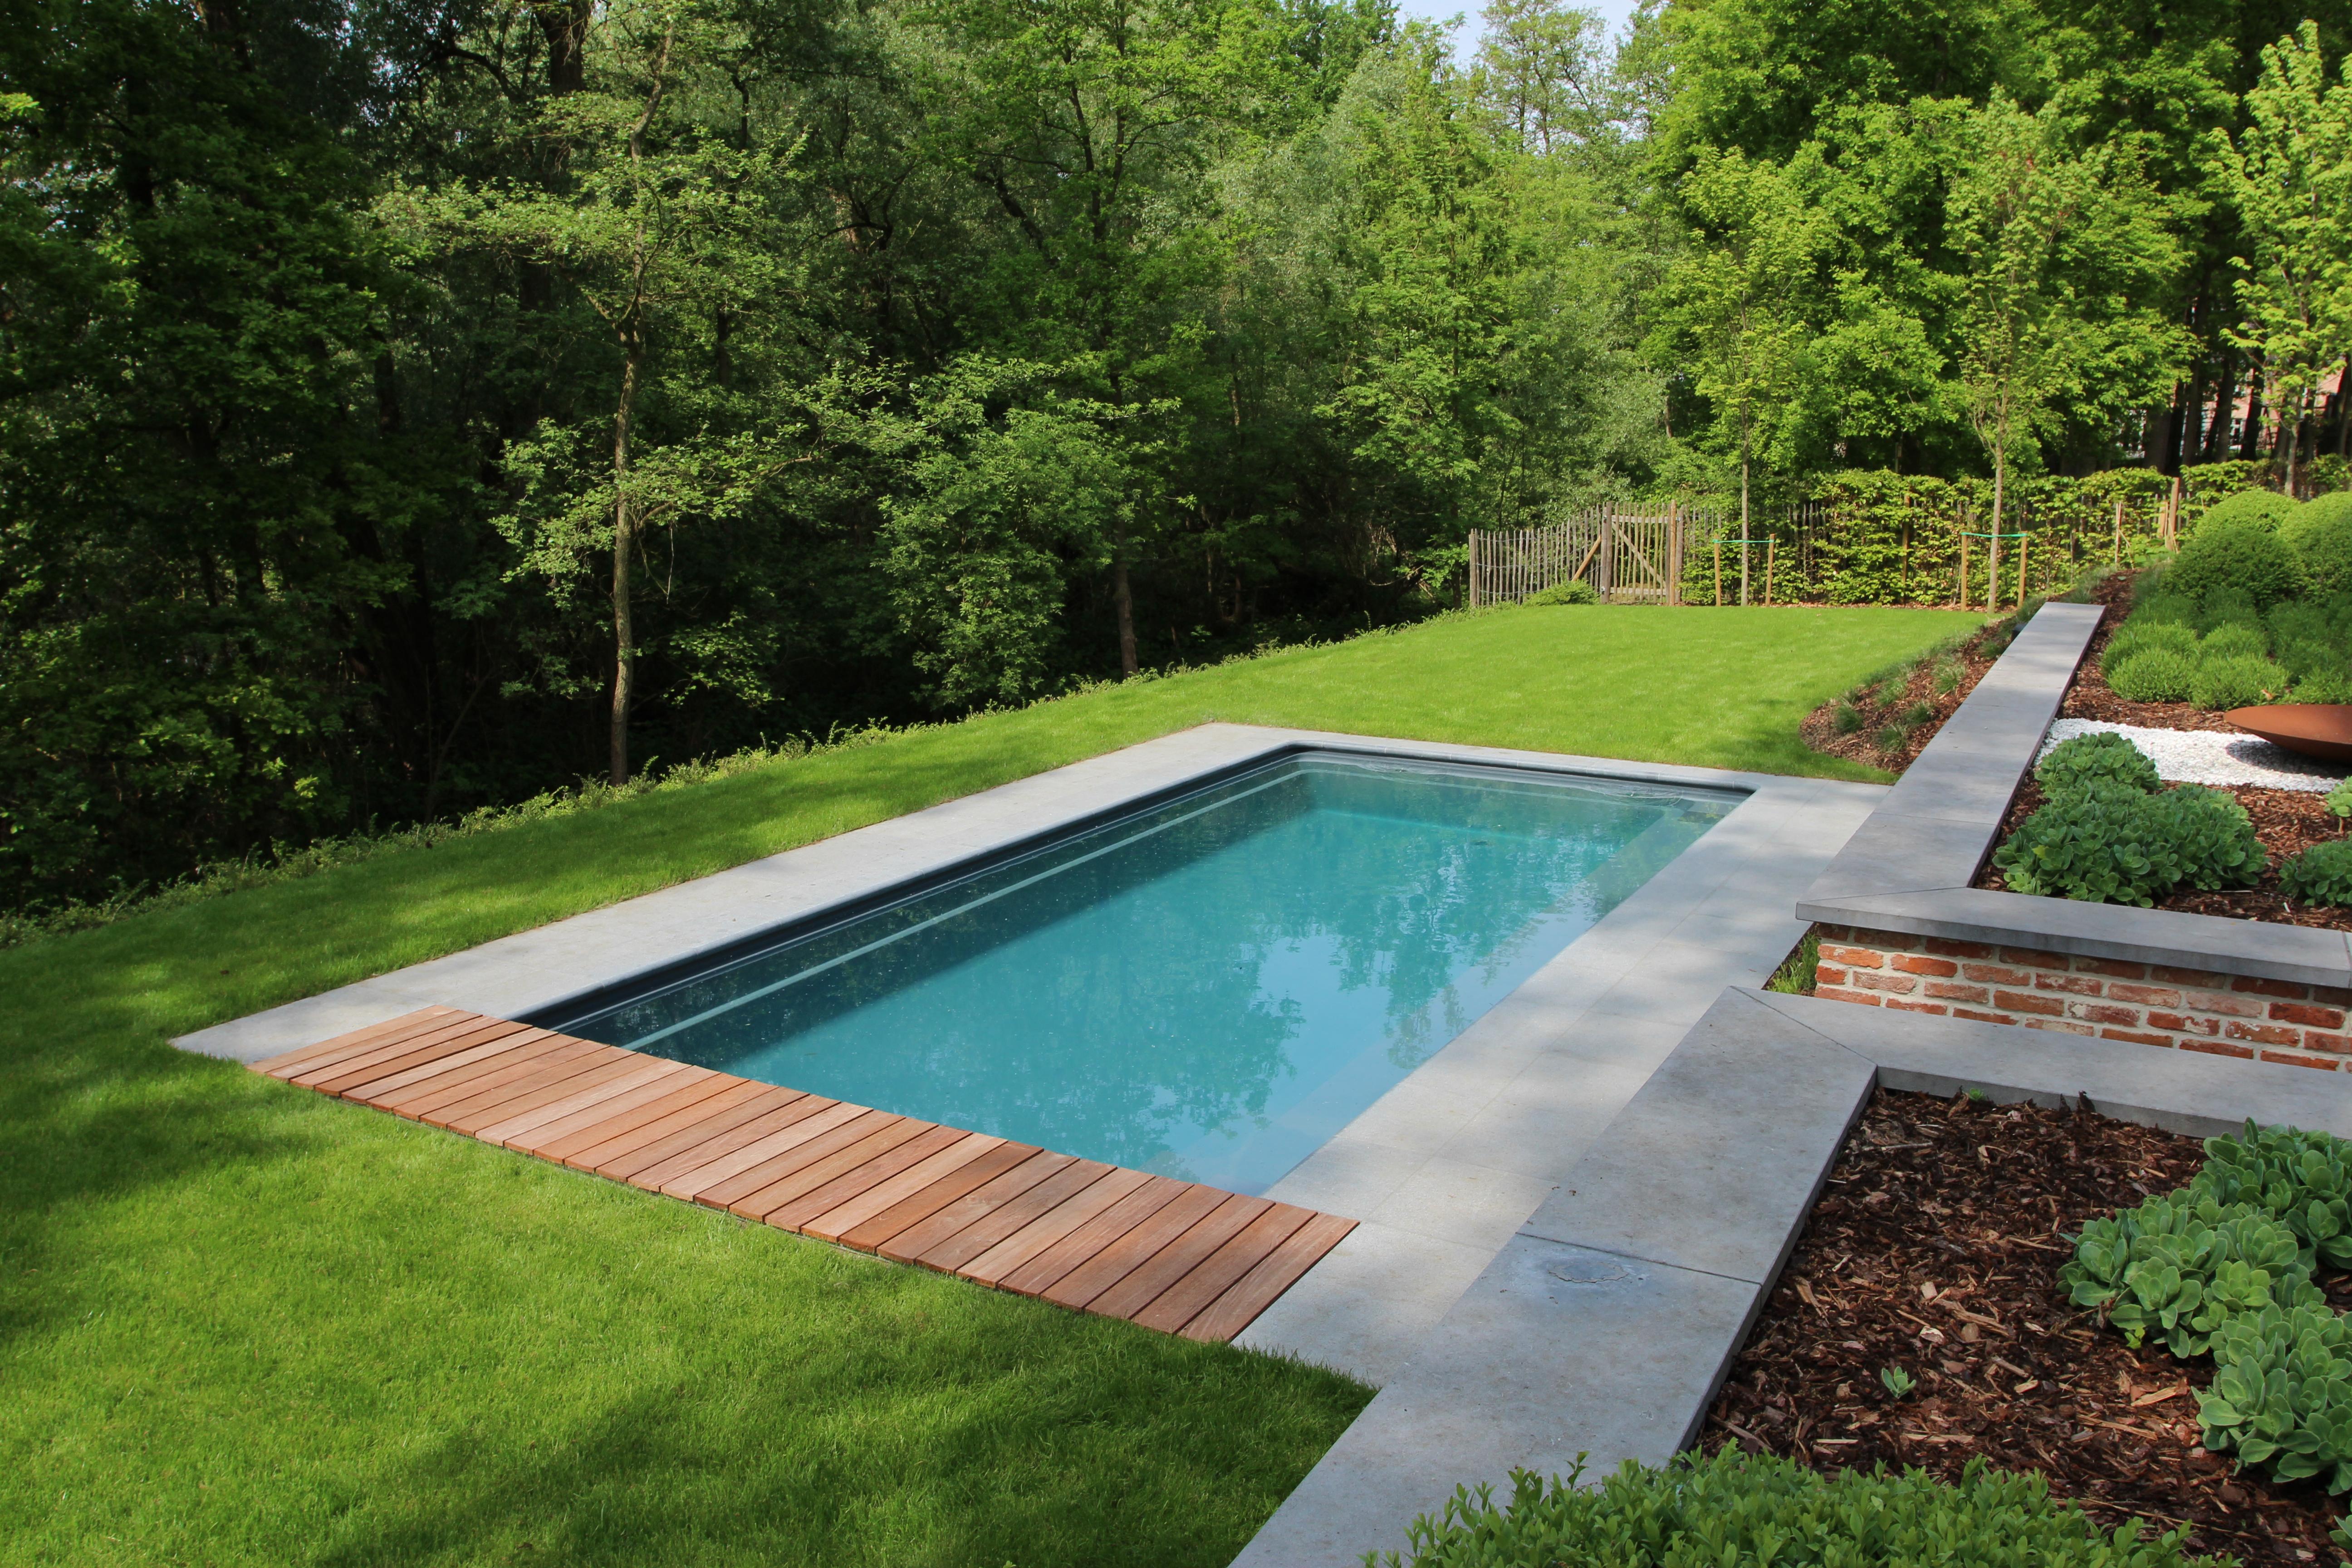 Leisure pools zwembad bouwers - Piscine leisure pools ...